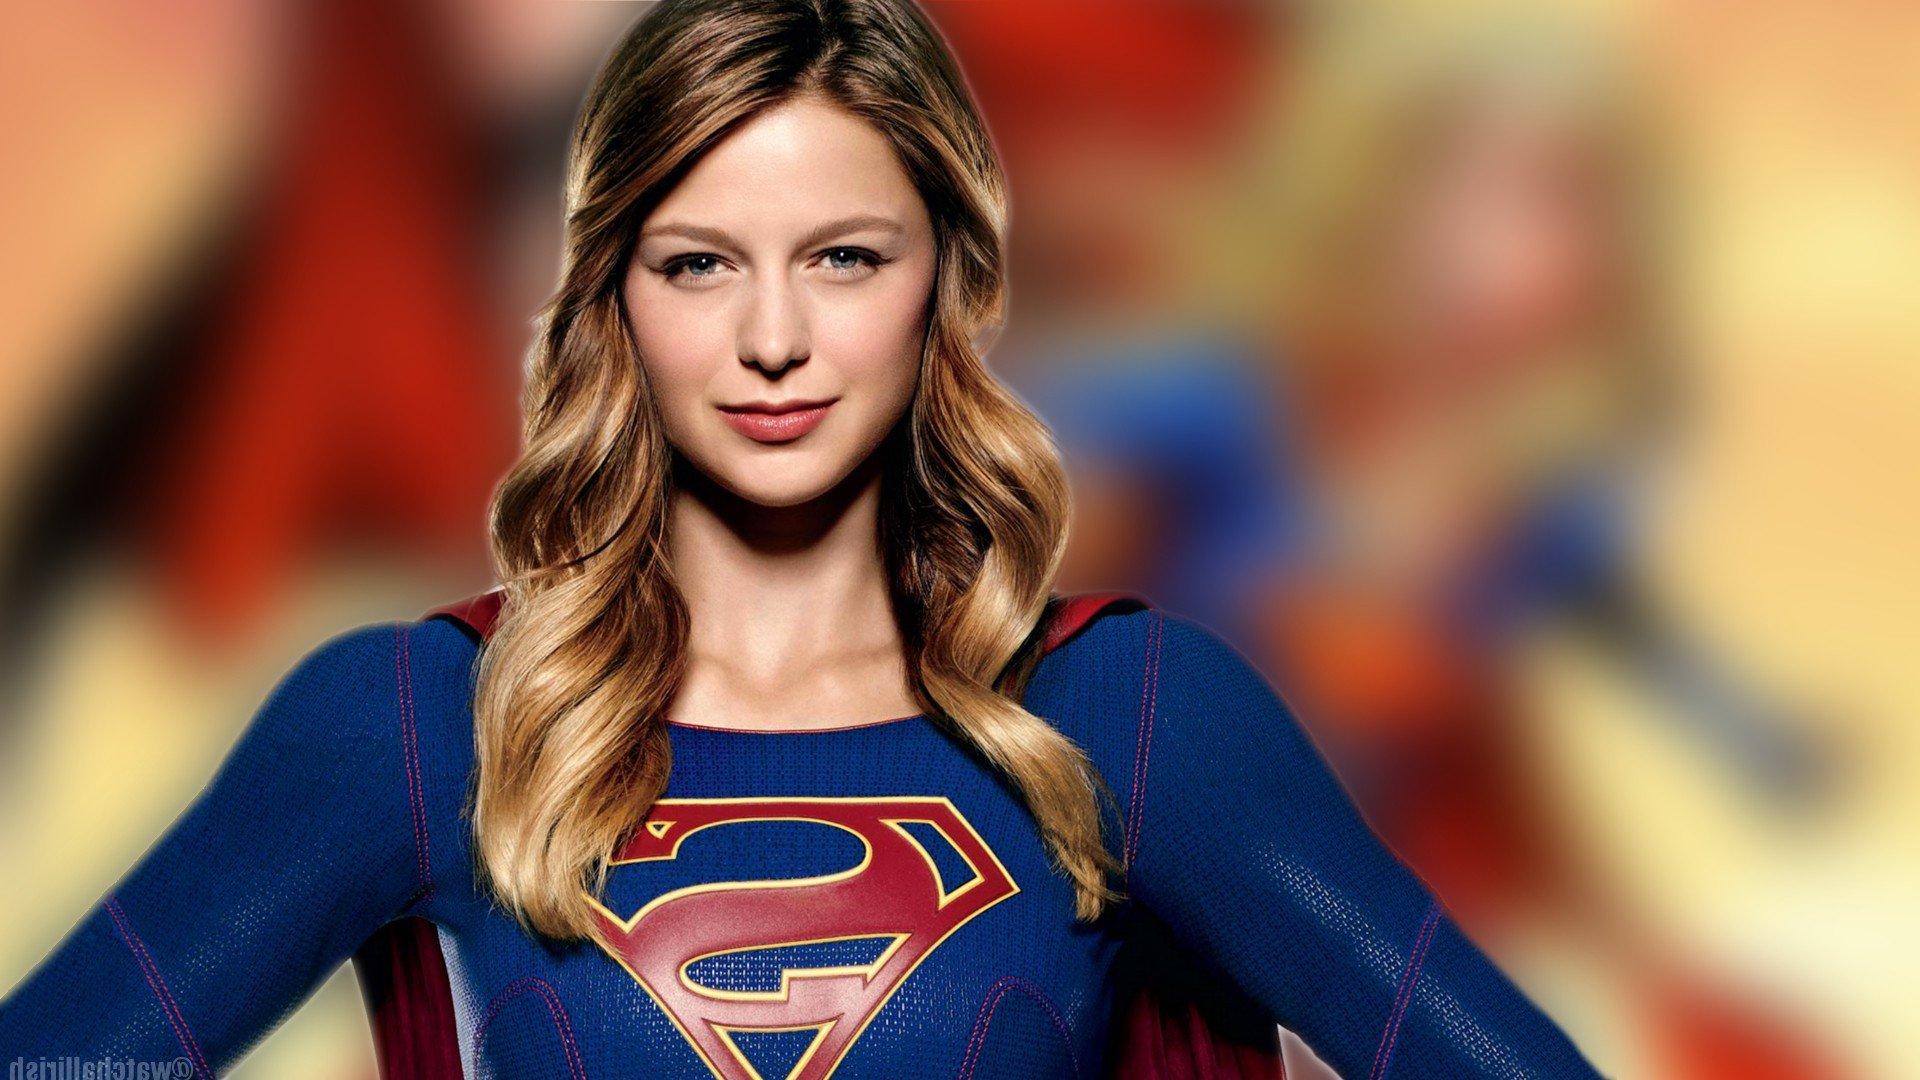 Live Pc Girl Wallpapers Fondos Serie Supergirl Wallpapers Gratis